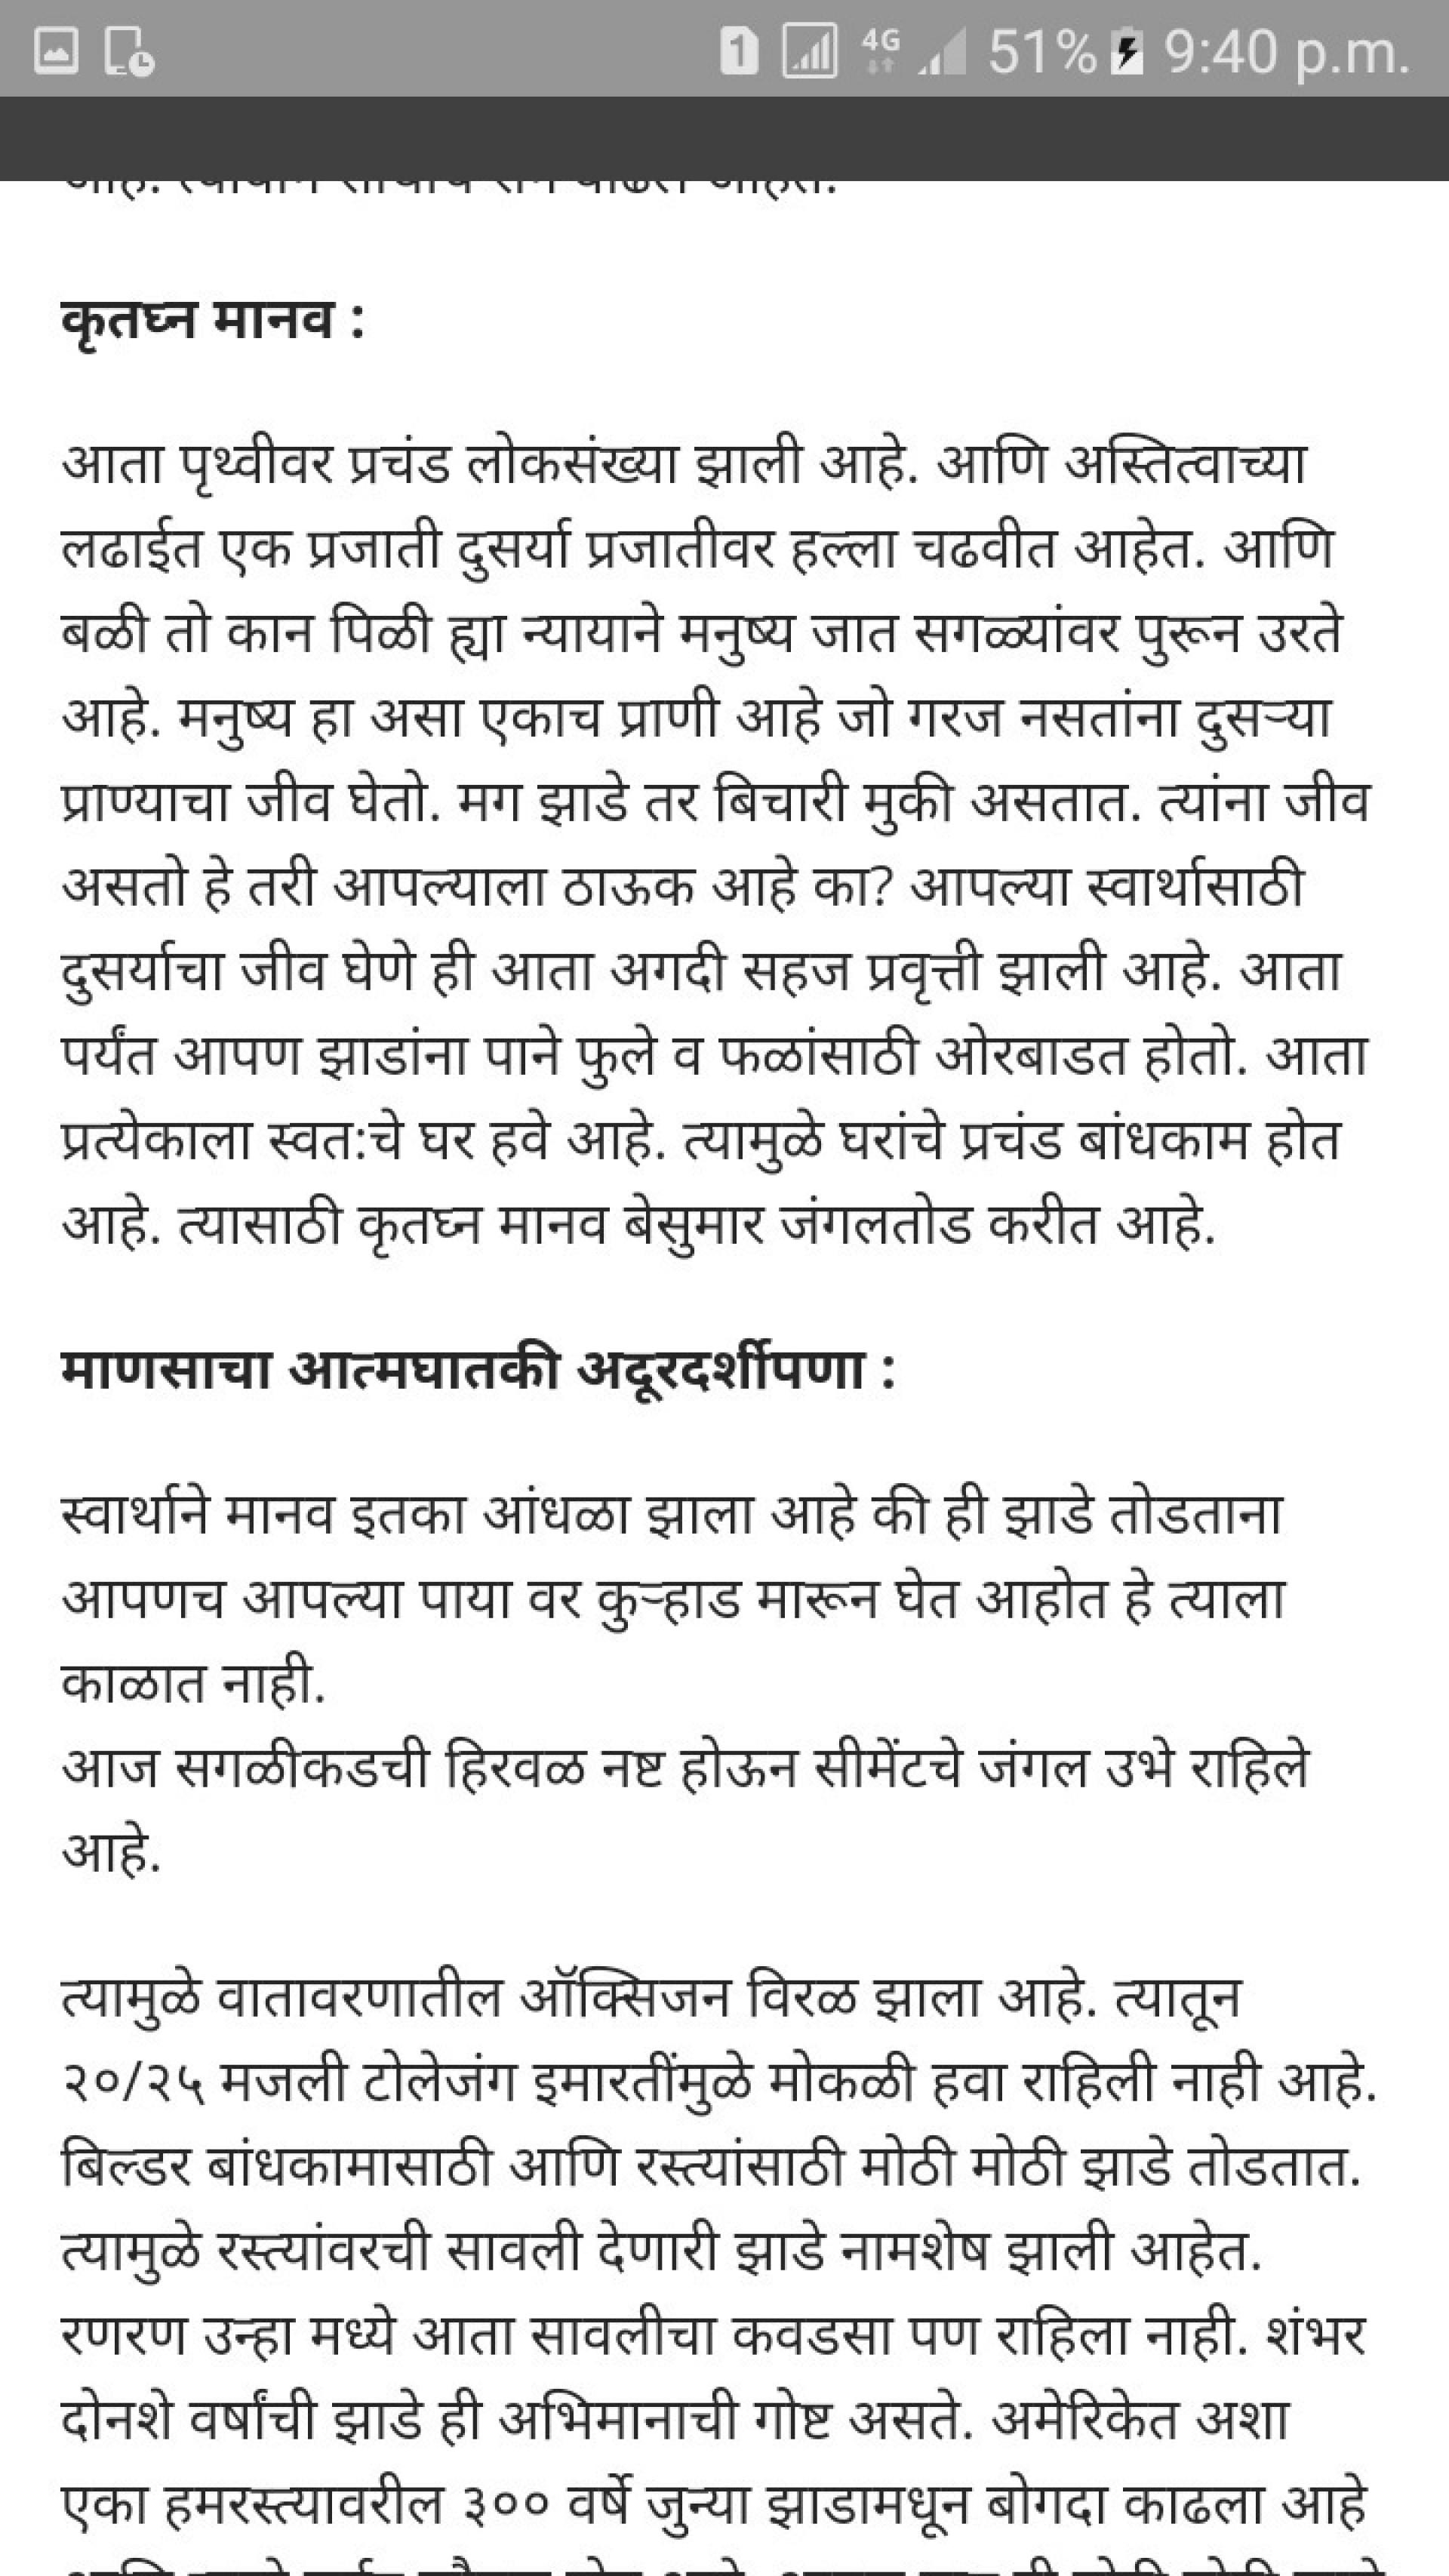 013 Tree Essay Unforgettable Neem In Sanskrit Kannada Hindi 1920